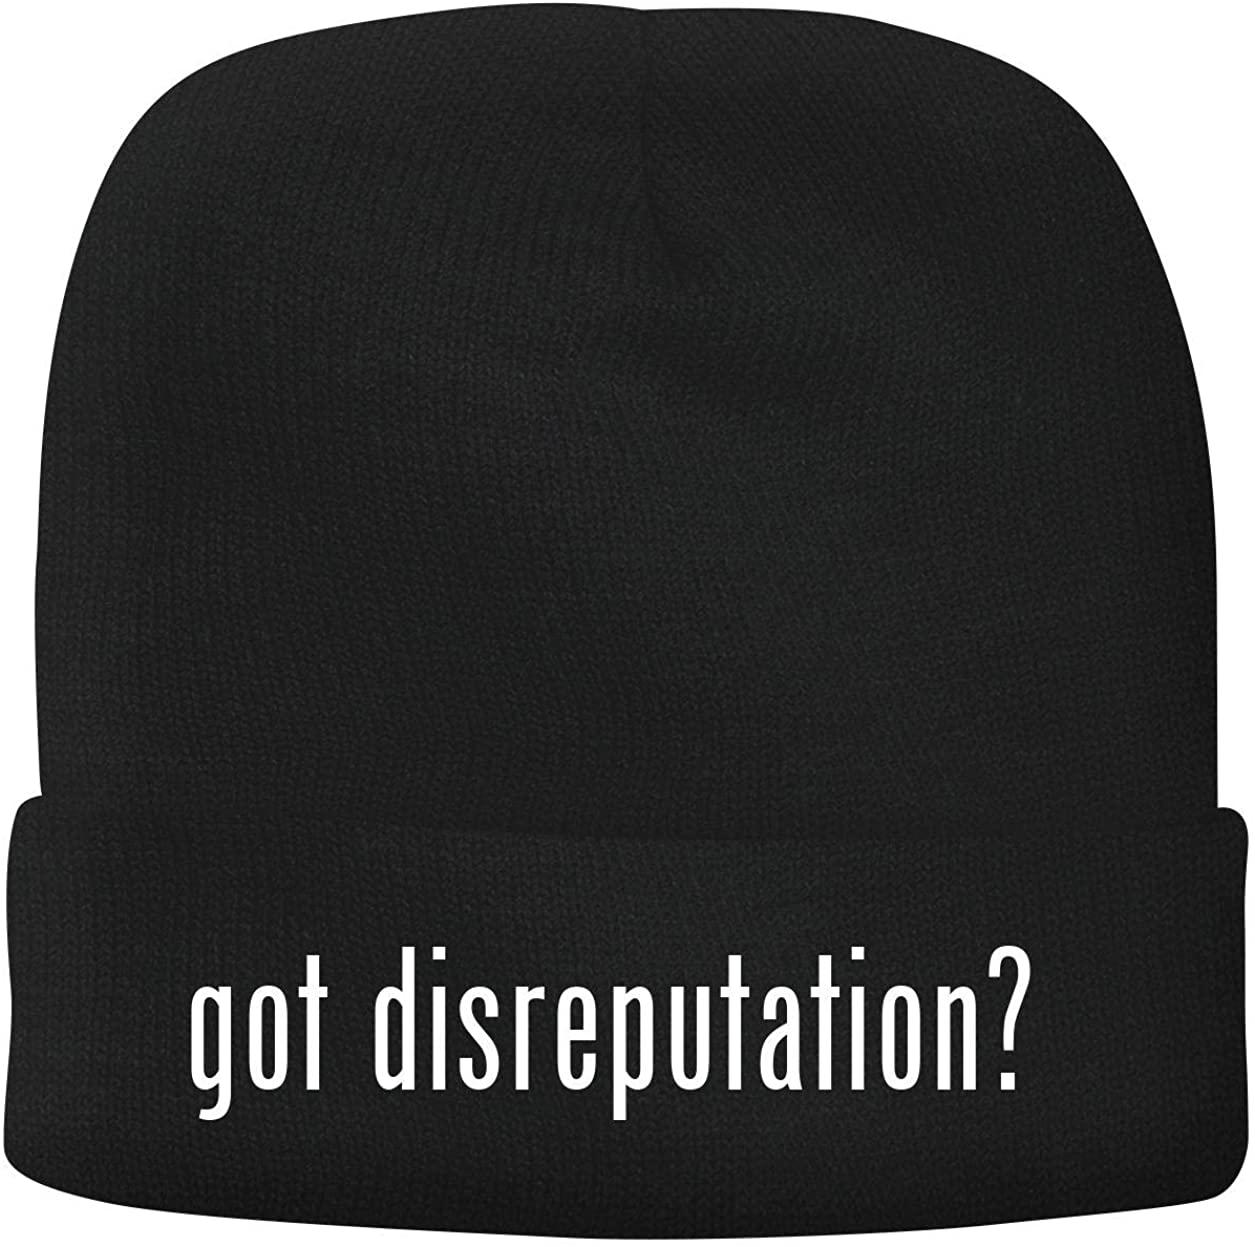 BH Cool Designs got Disreputation? - Men's Soft & Comfortable Beanie Hat Cap